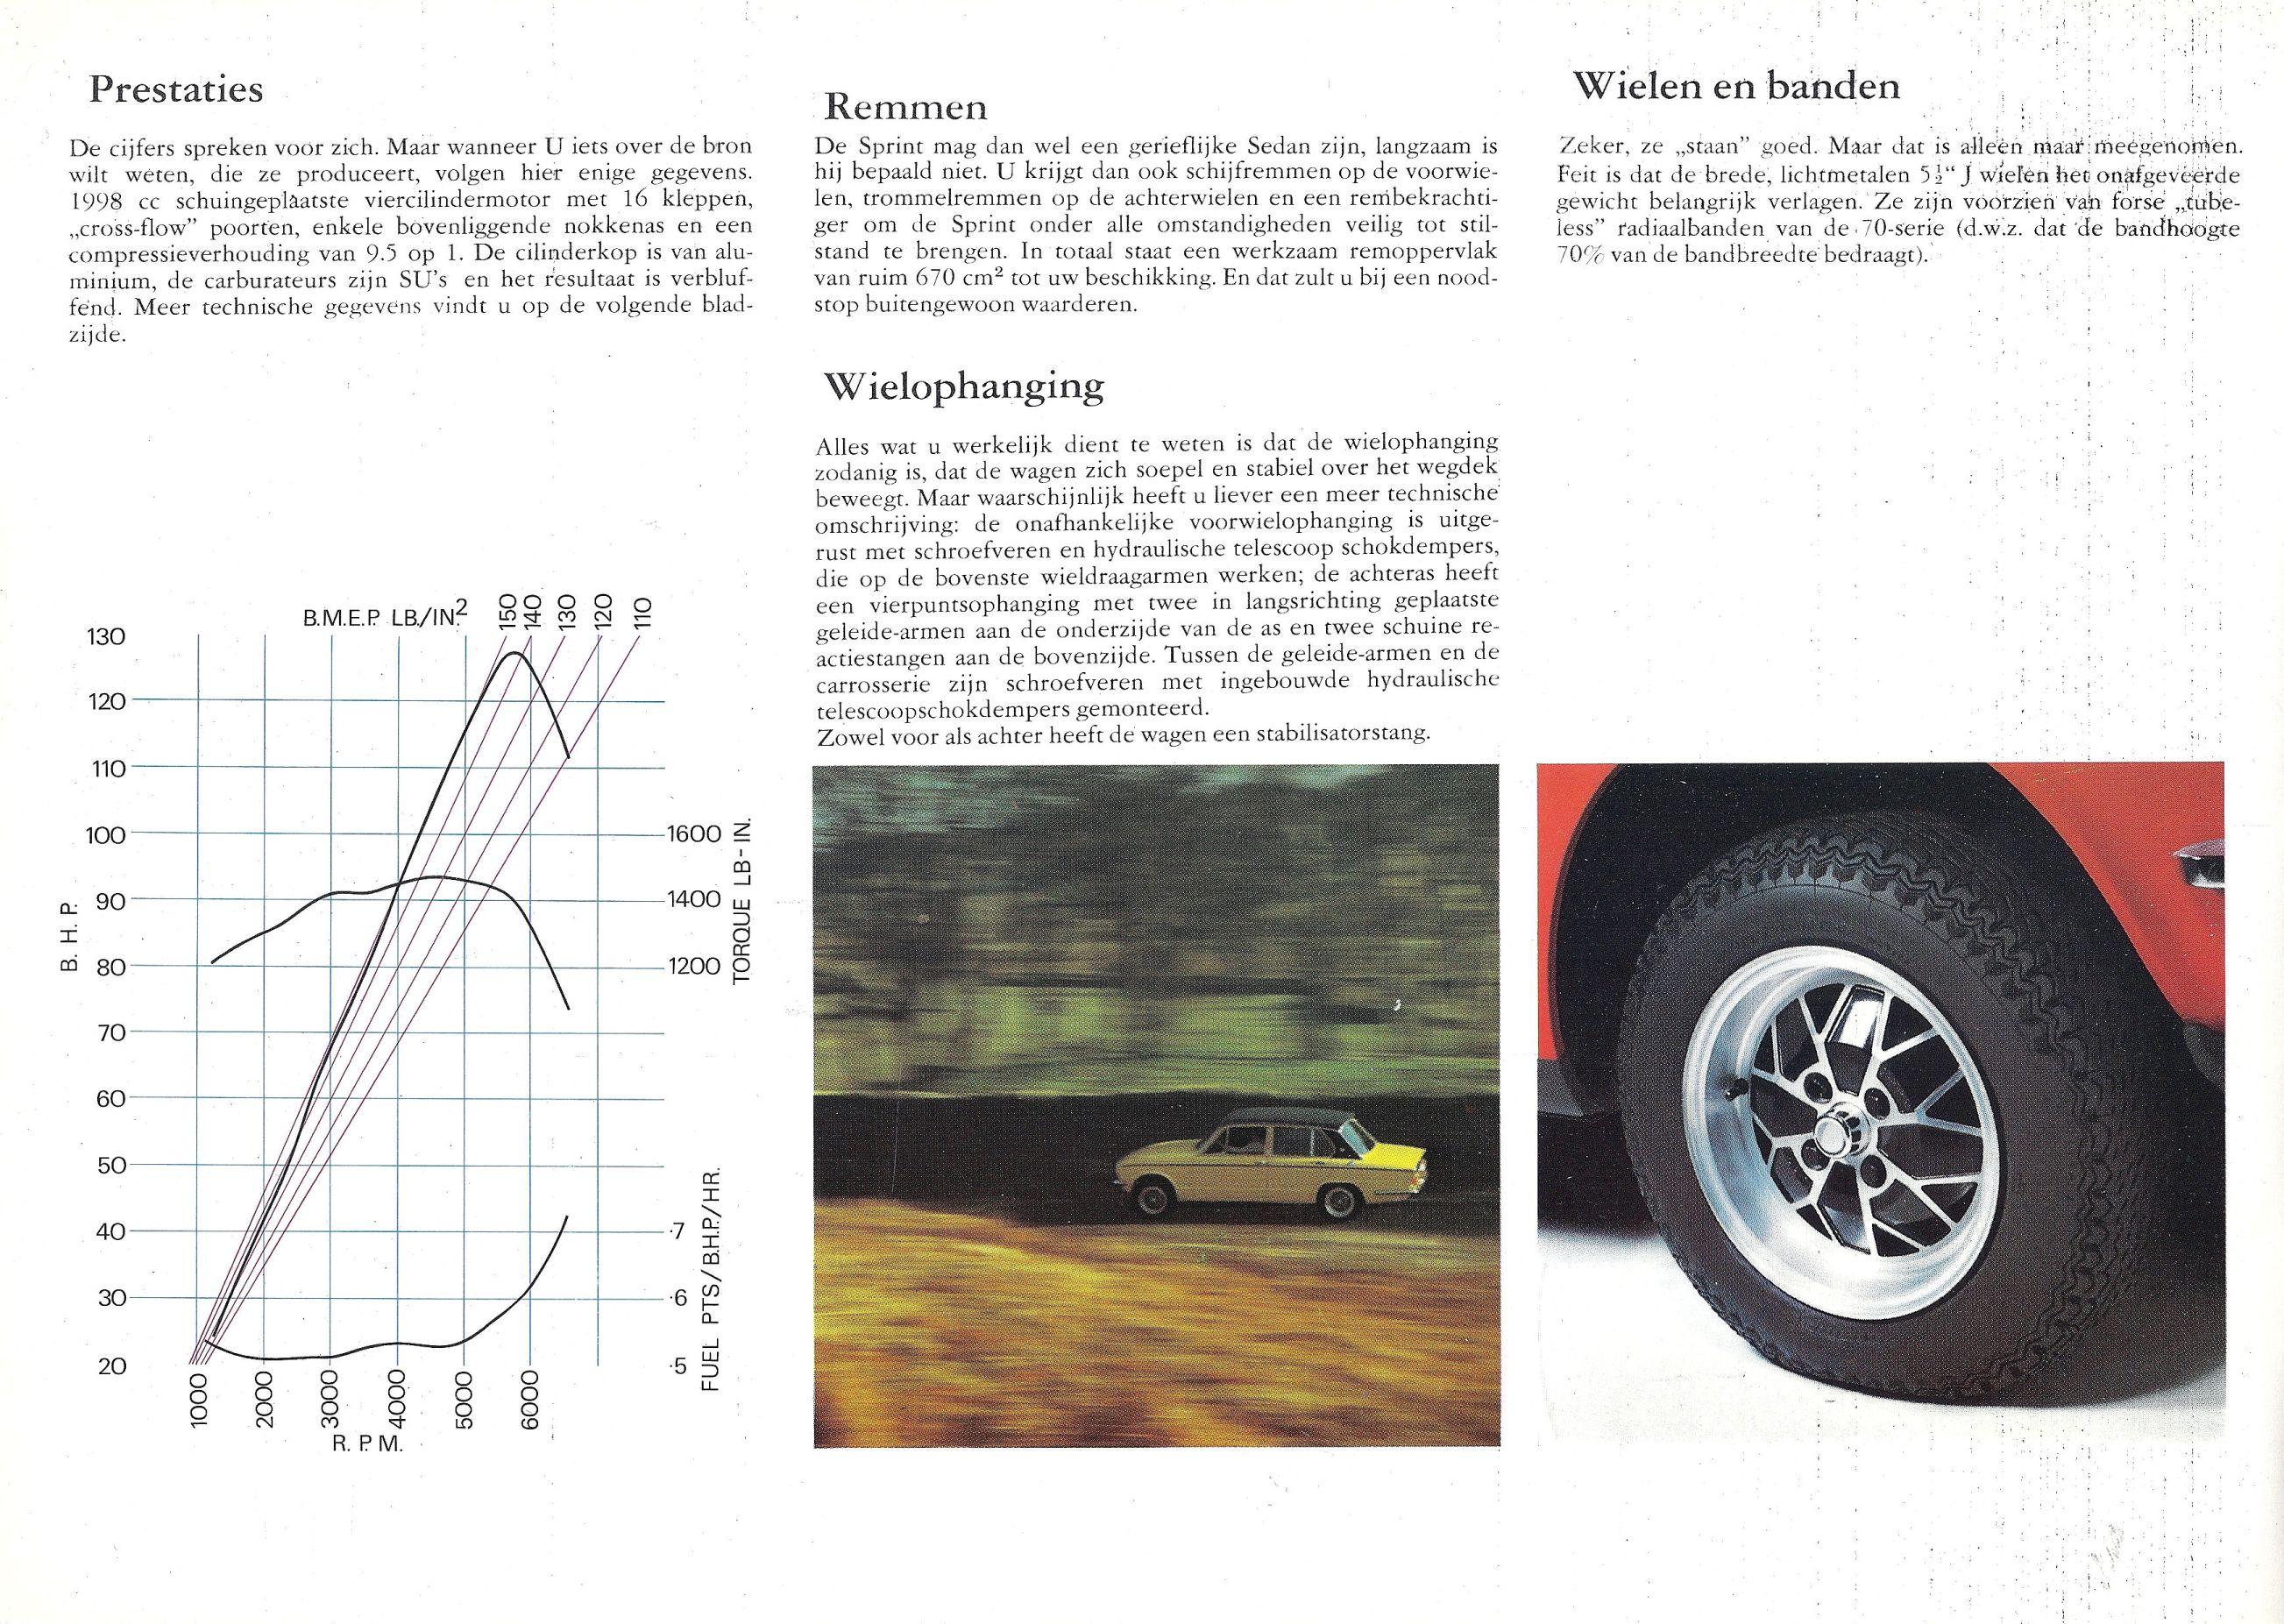 triumph dolomite sprint brochure manual dometic control touch single zone manual dometic model dm265ldfx manual